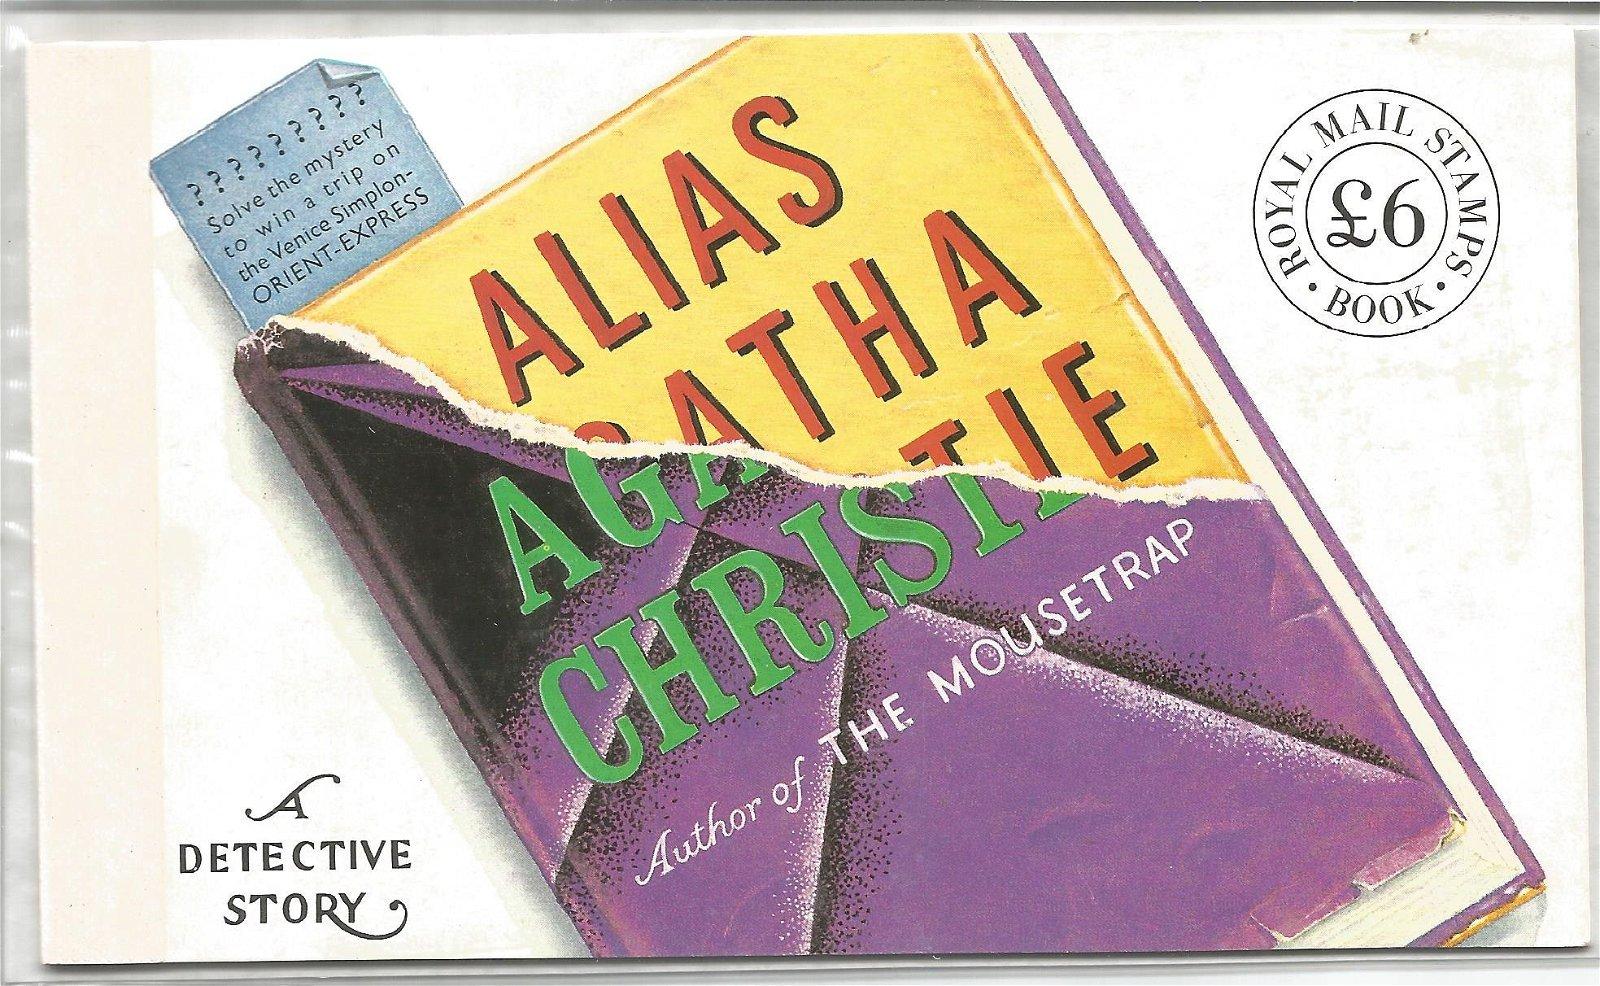 Royal Mail complete prestige stamp booklet, A Detective